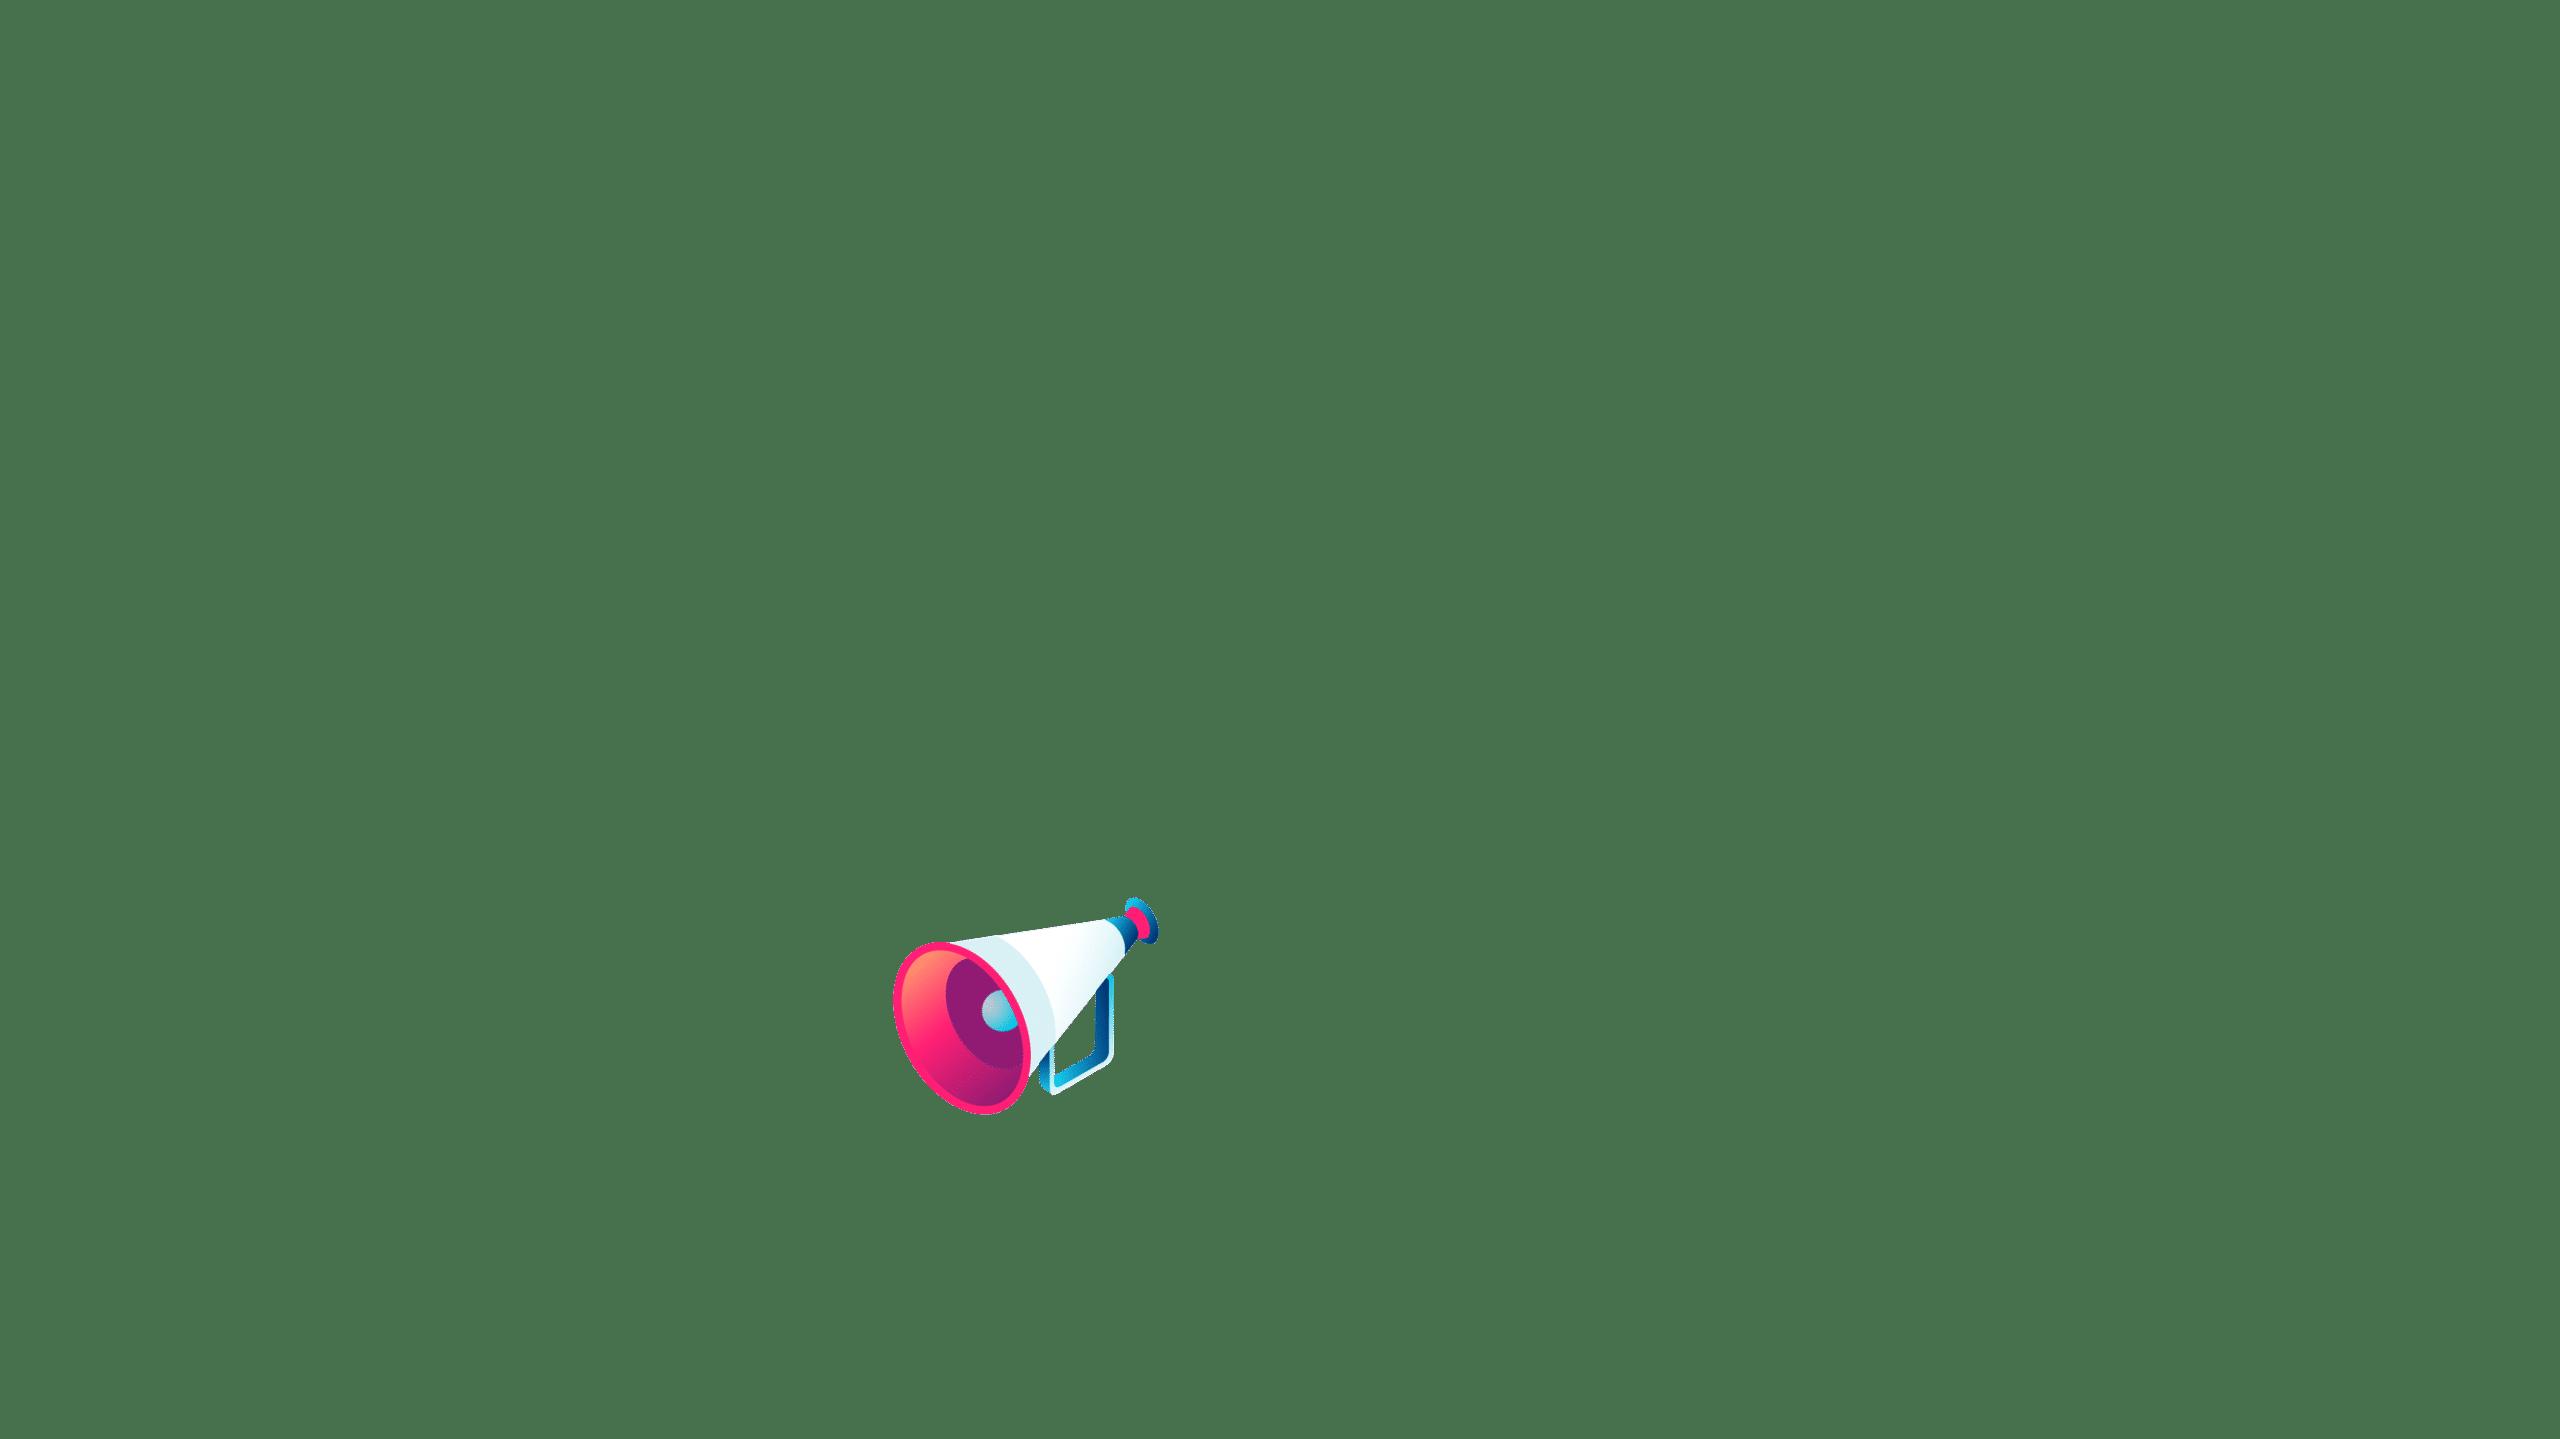 Bullhorn-hologram@4x